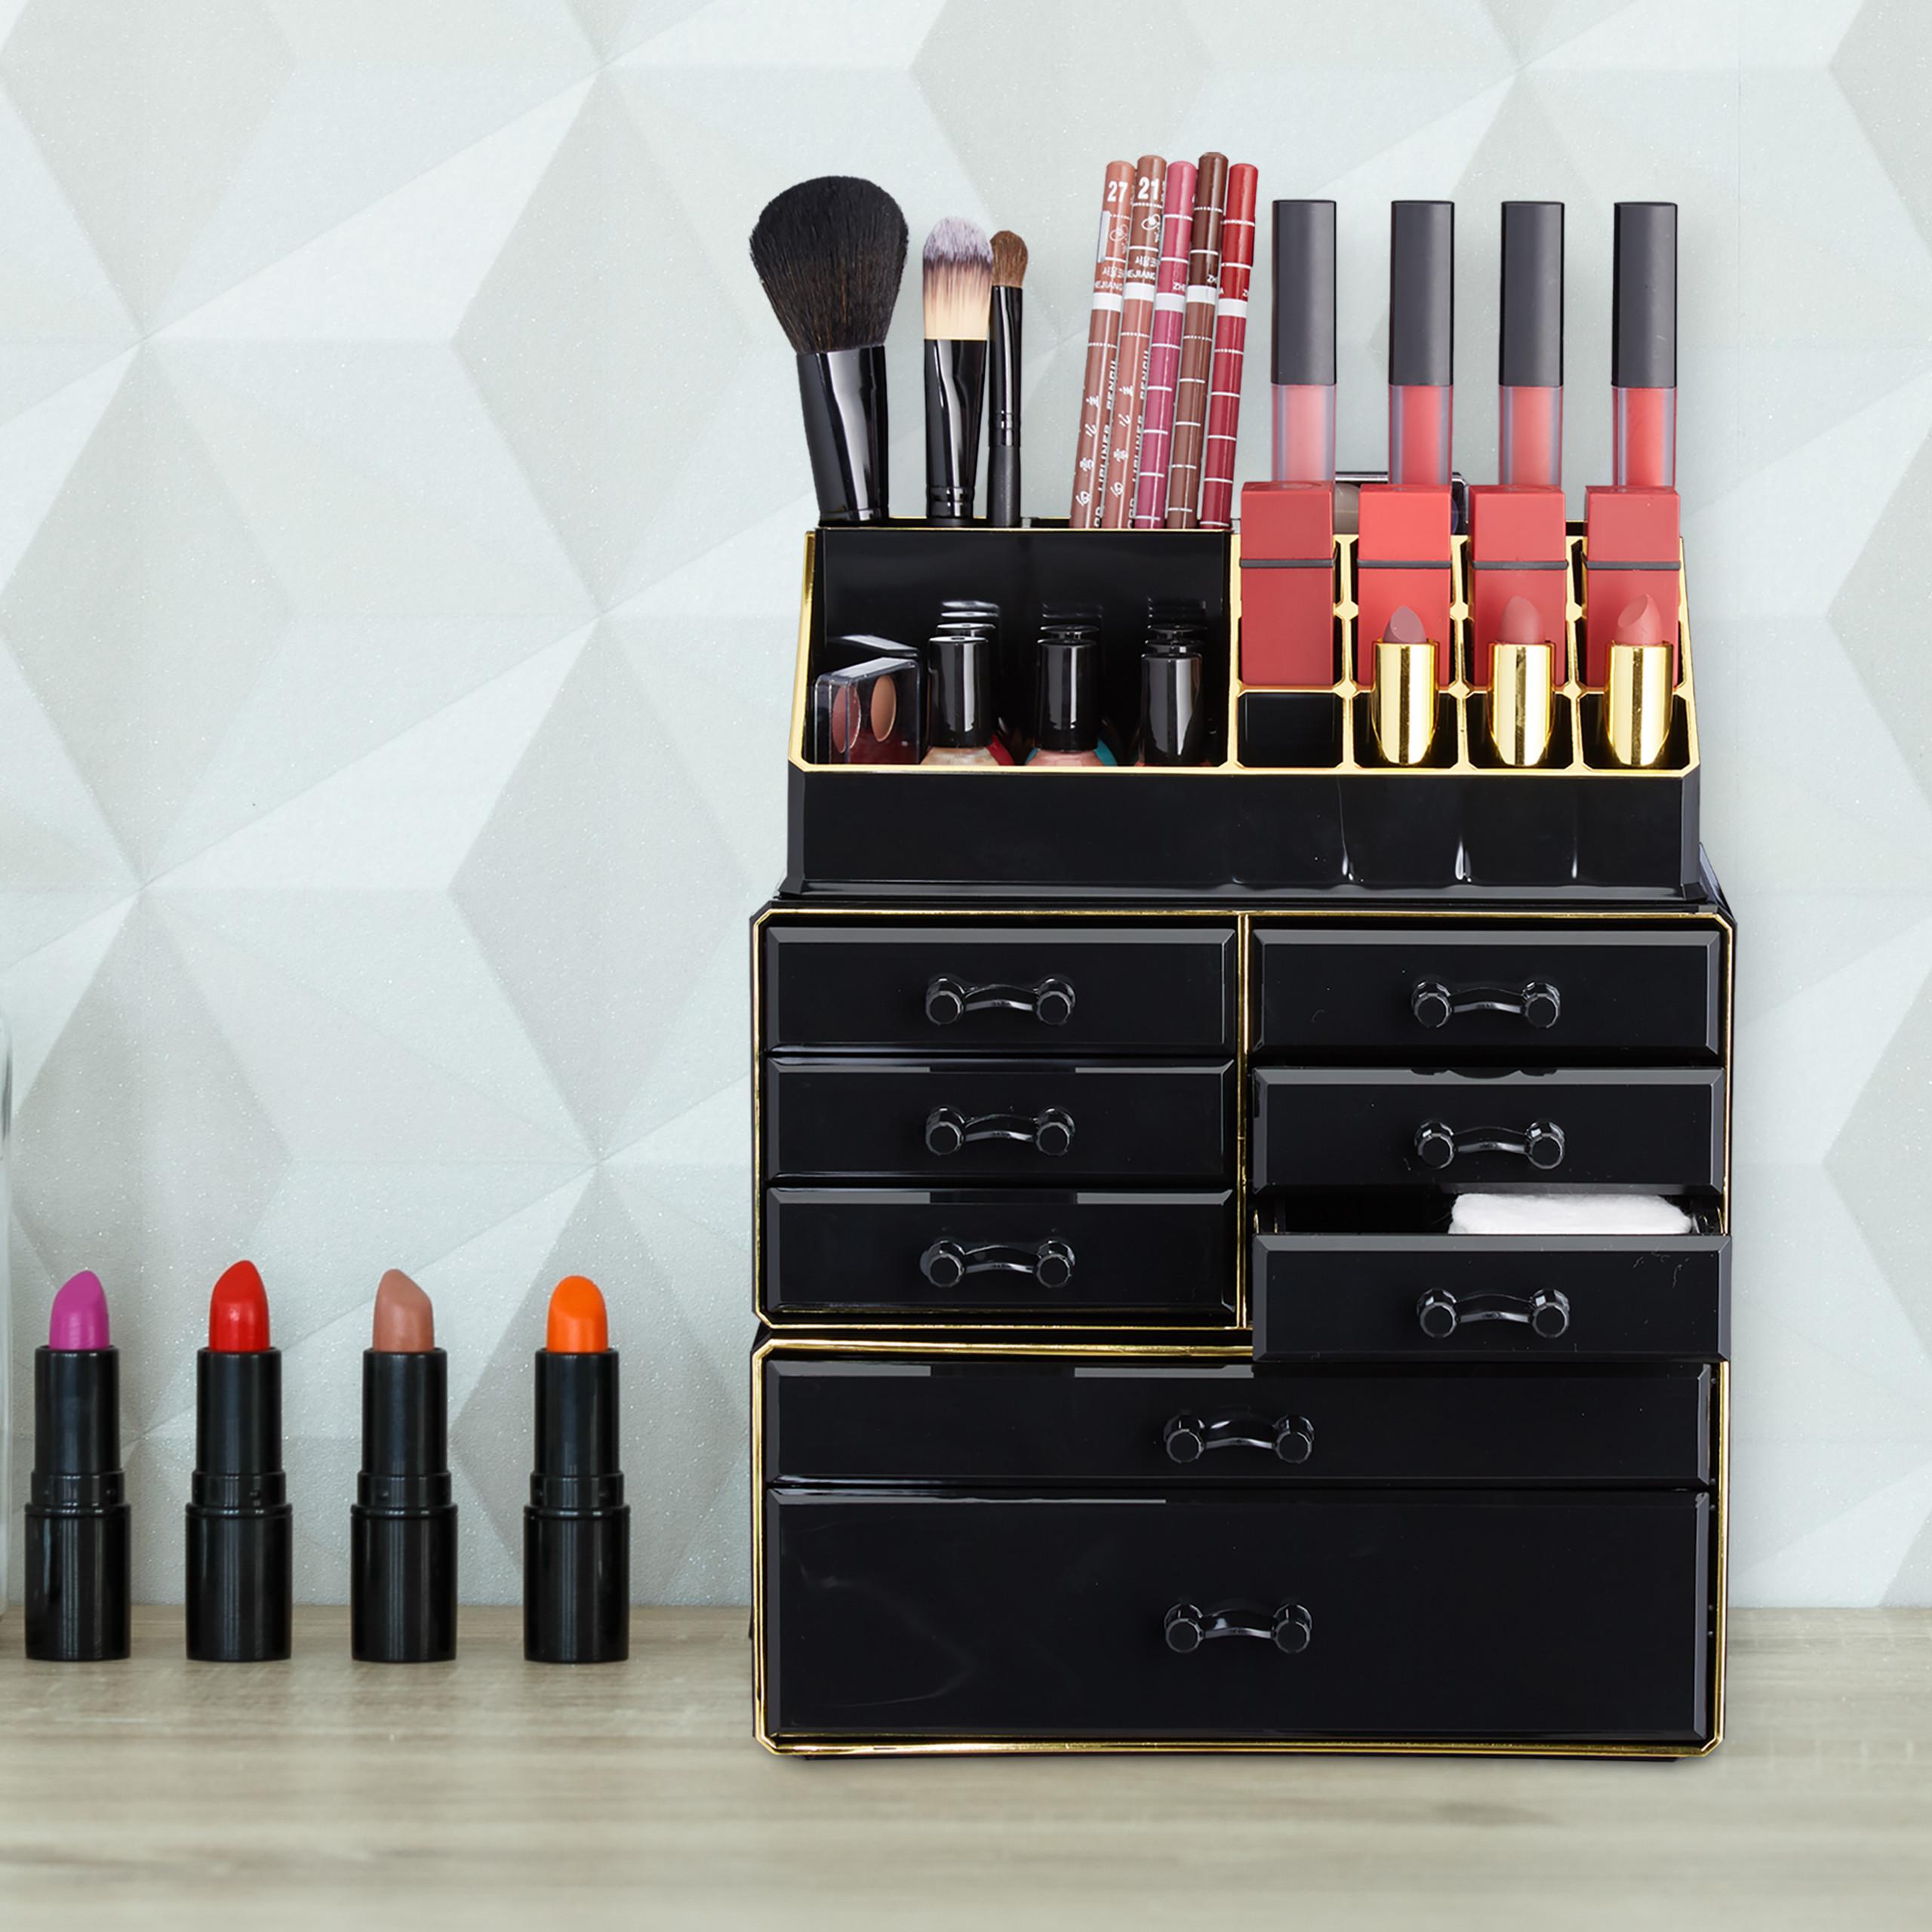 make-up-organizer-opbergen-van-cosmetica-acryl-stapelbaar-met-lades miniatuur 38